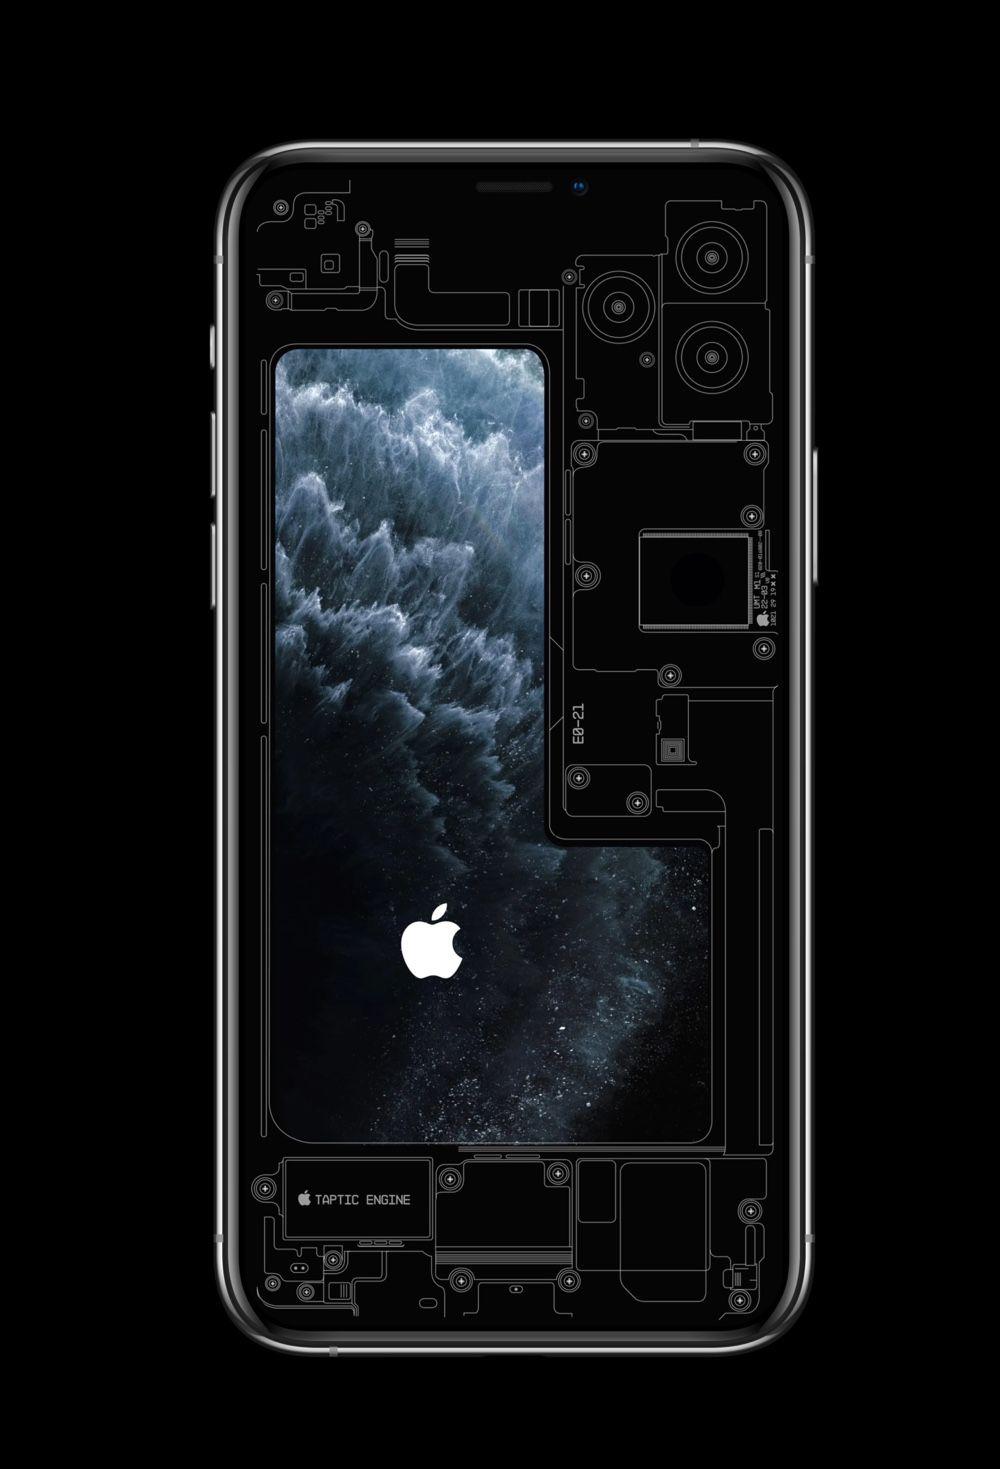 Des Fonds D Ecran Qui Exposent Les Entrailles Des Iphone 11